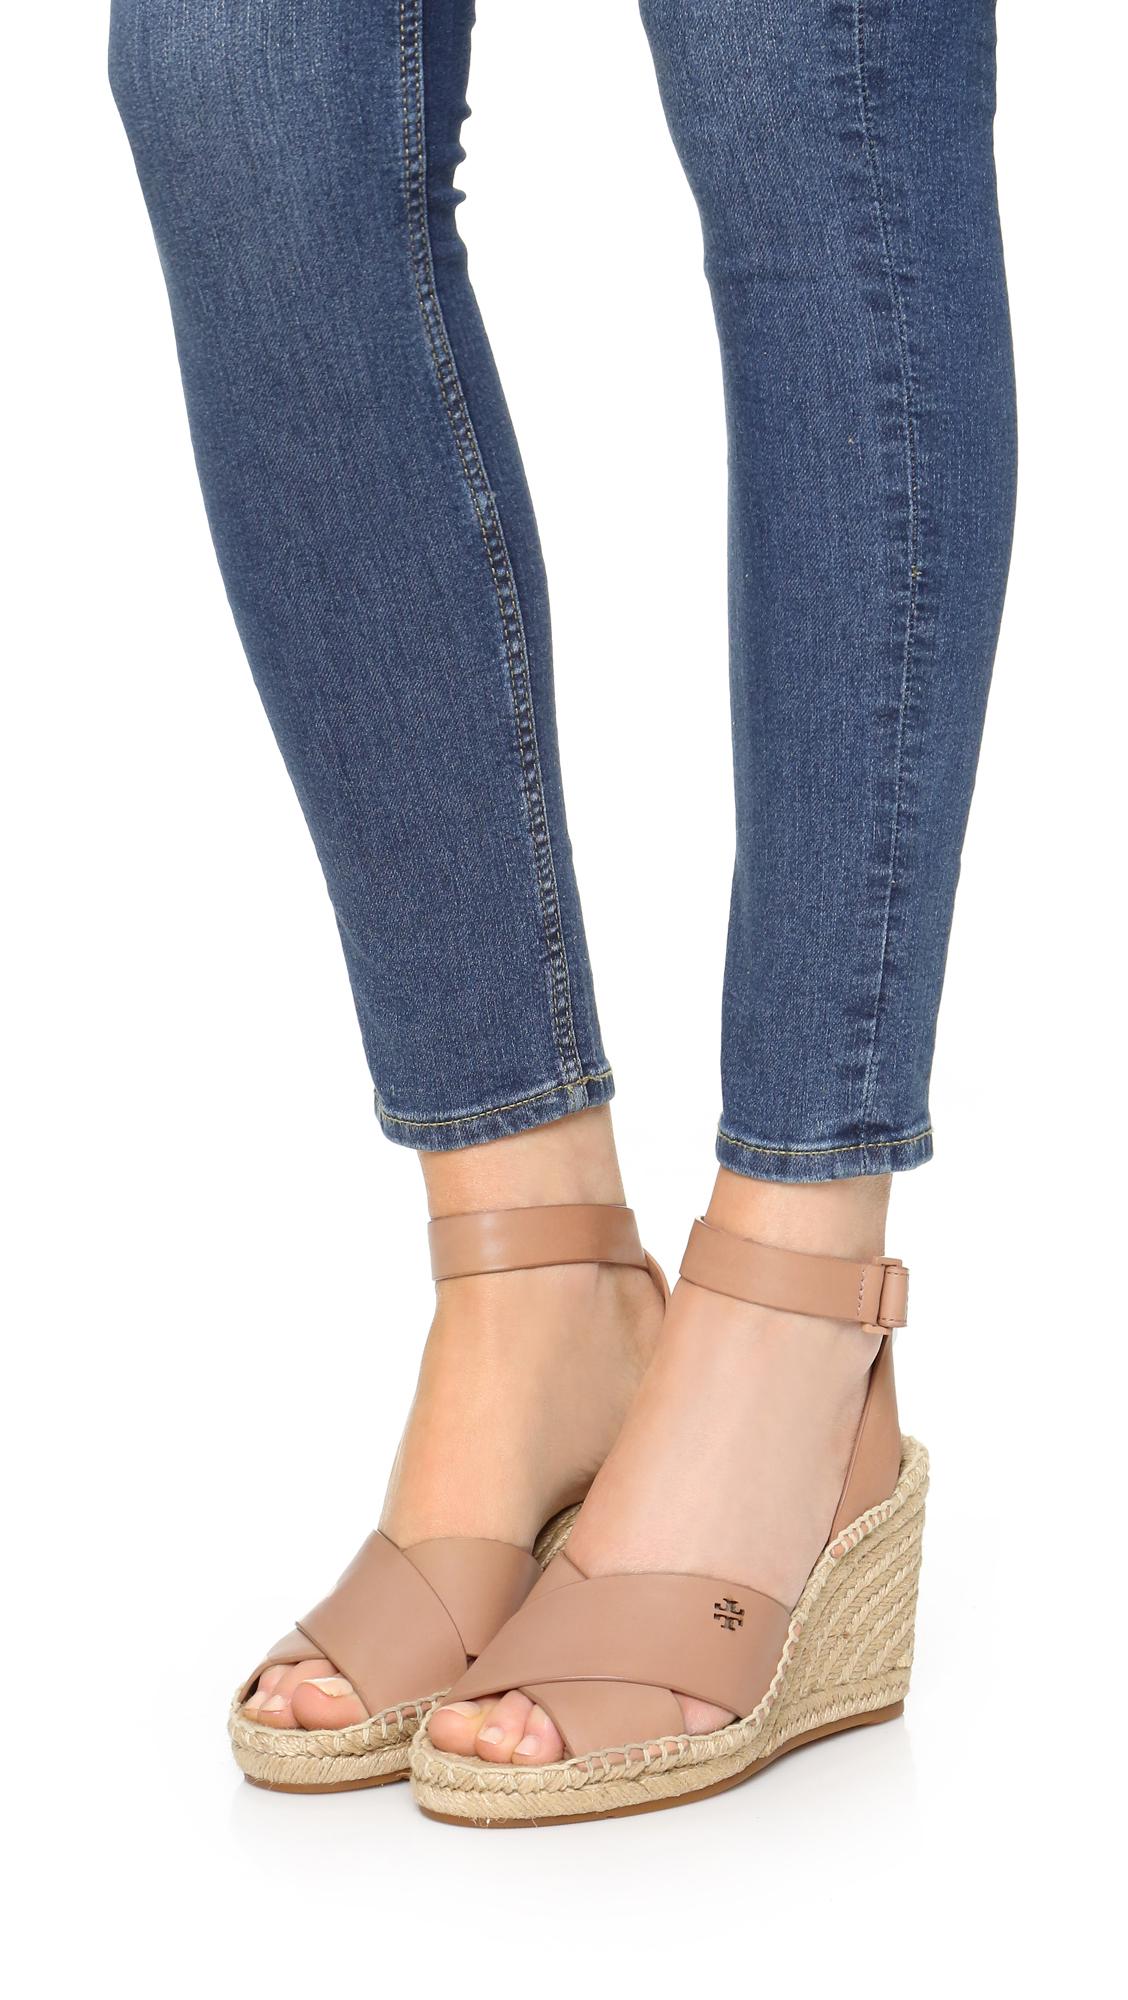 2df8cd545 Tory Burch Bima Wedge Espadrille Sandals